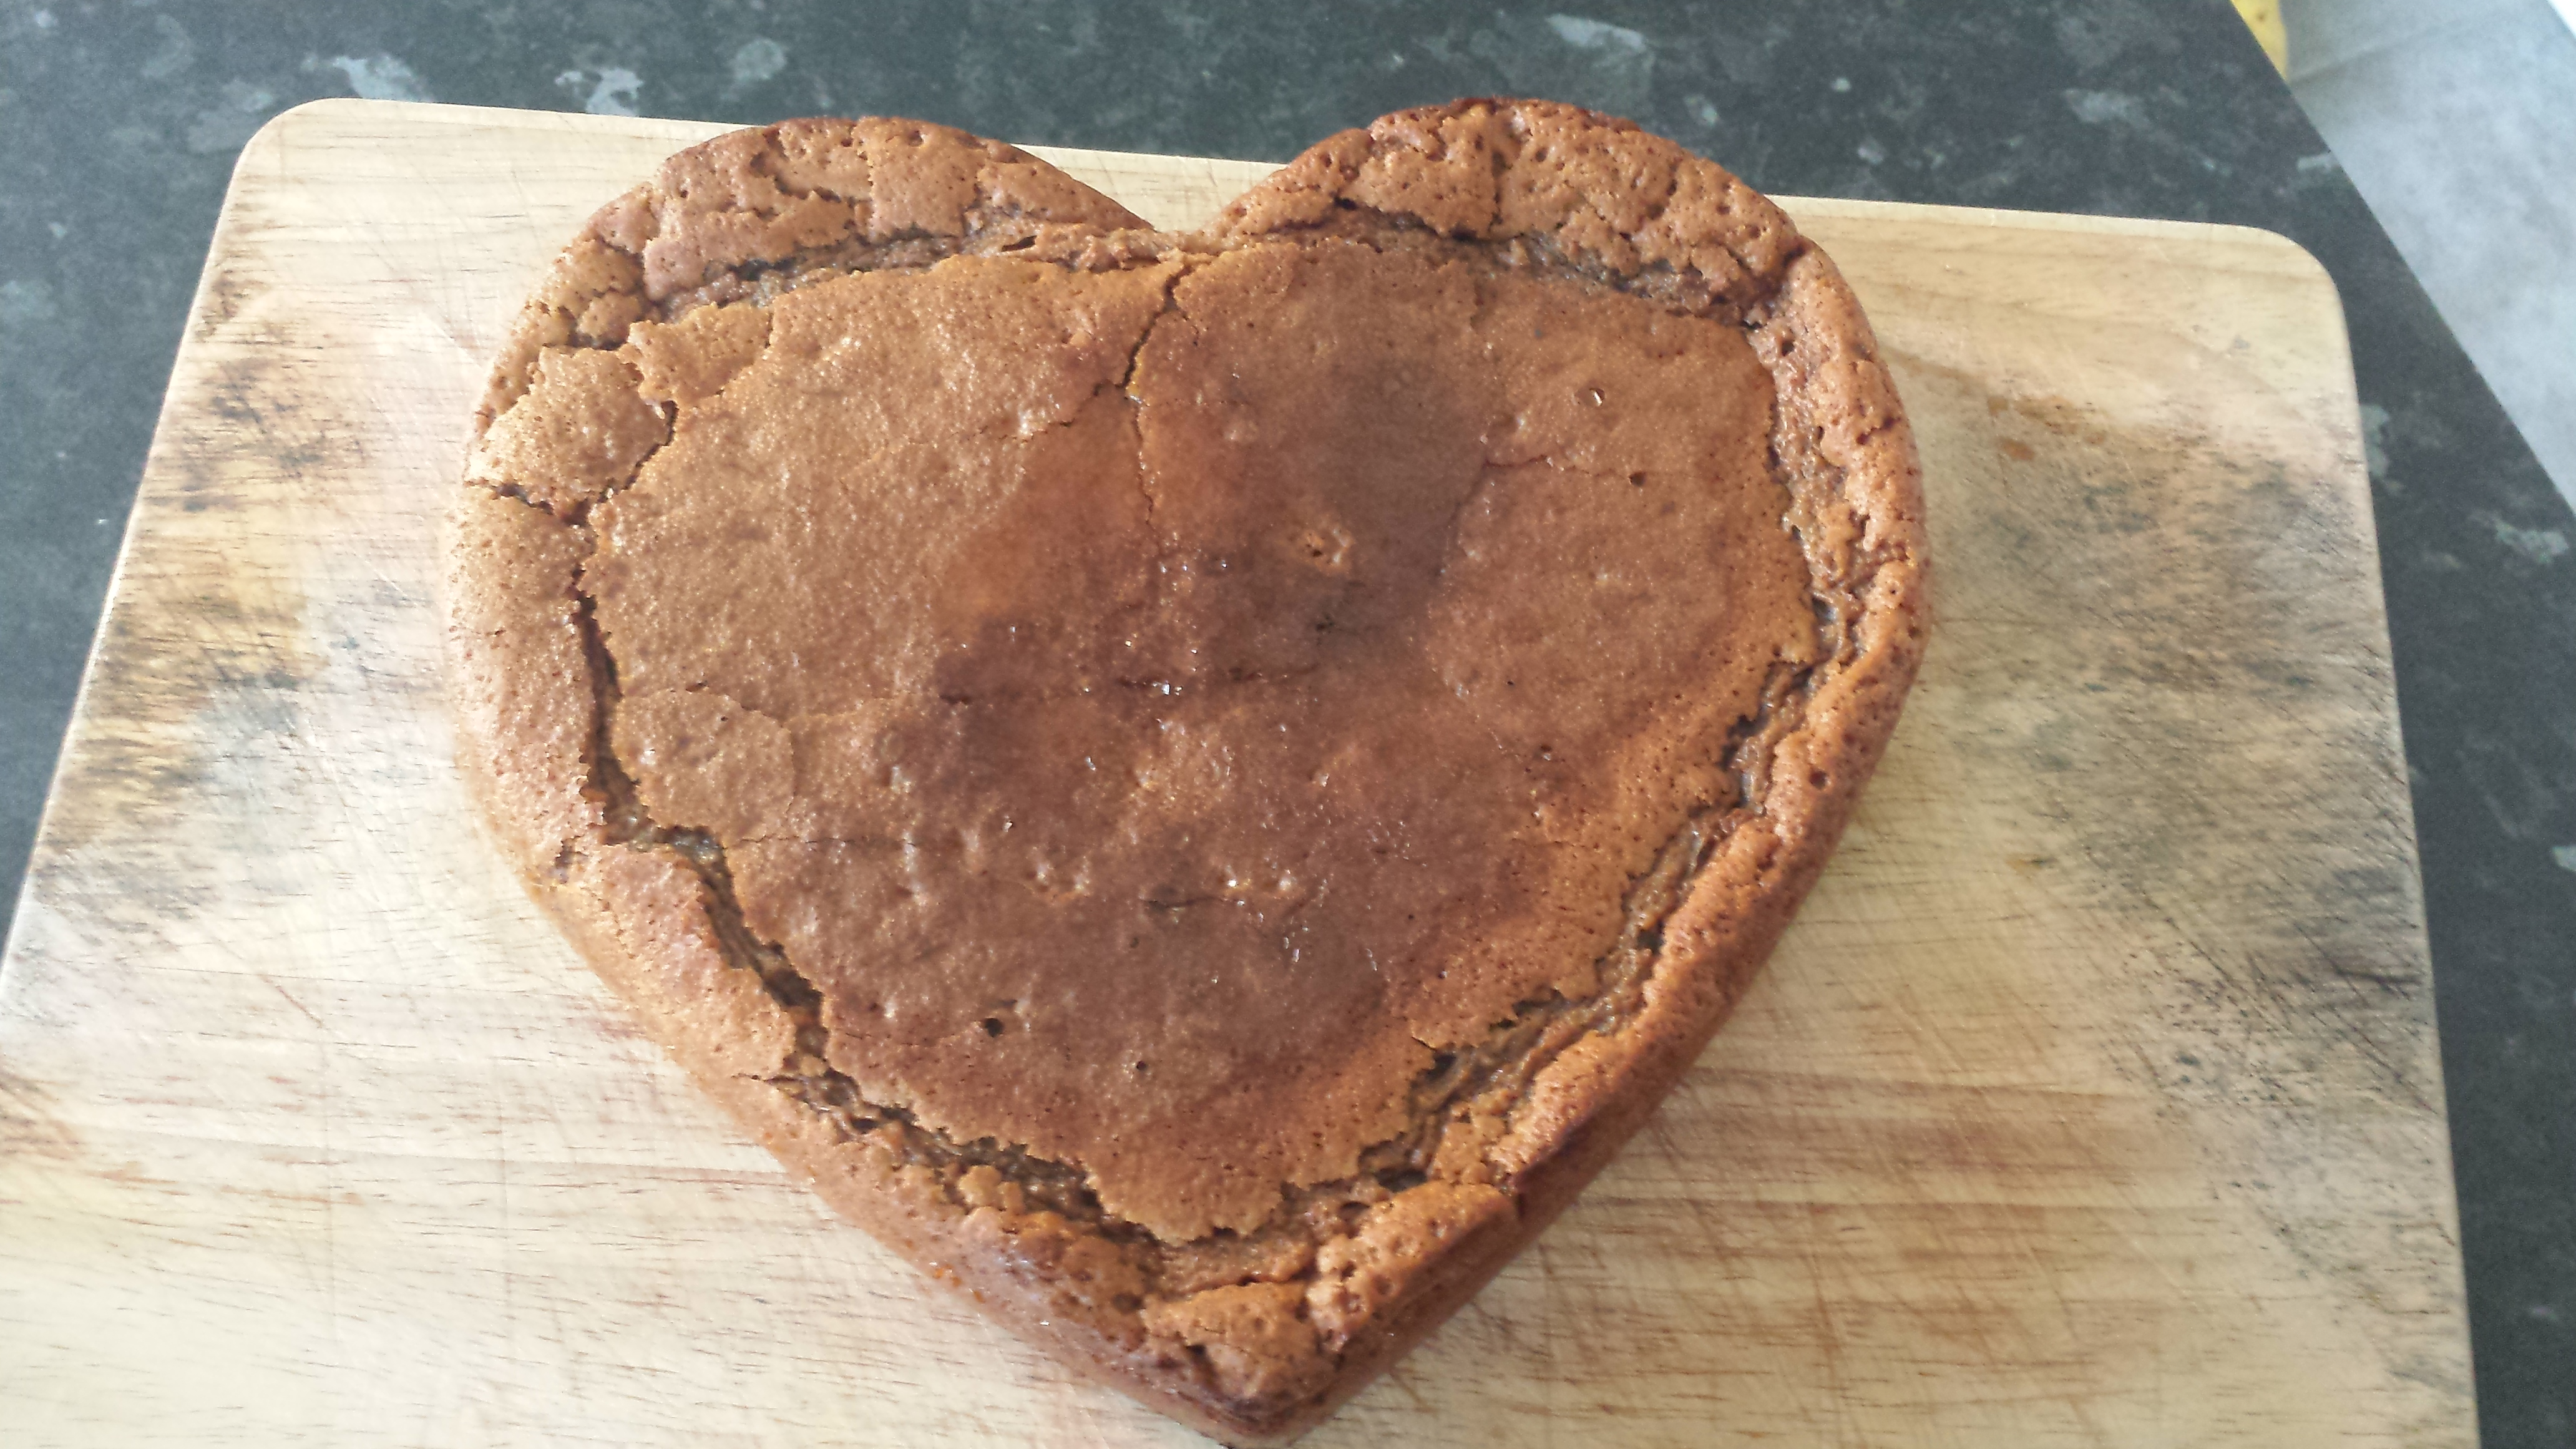 Sinfully Good Gluten Free Chocolate Cake